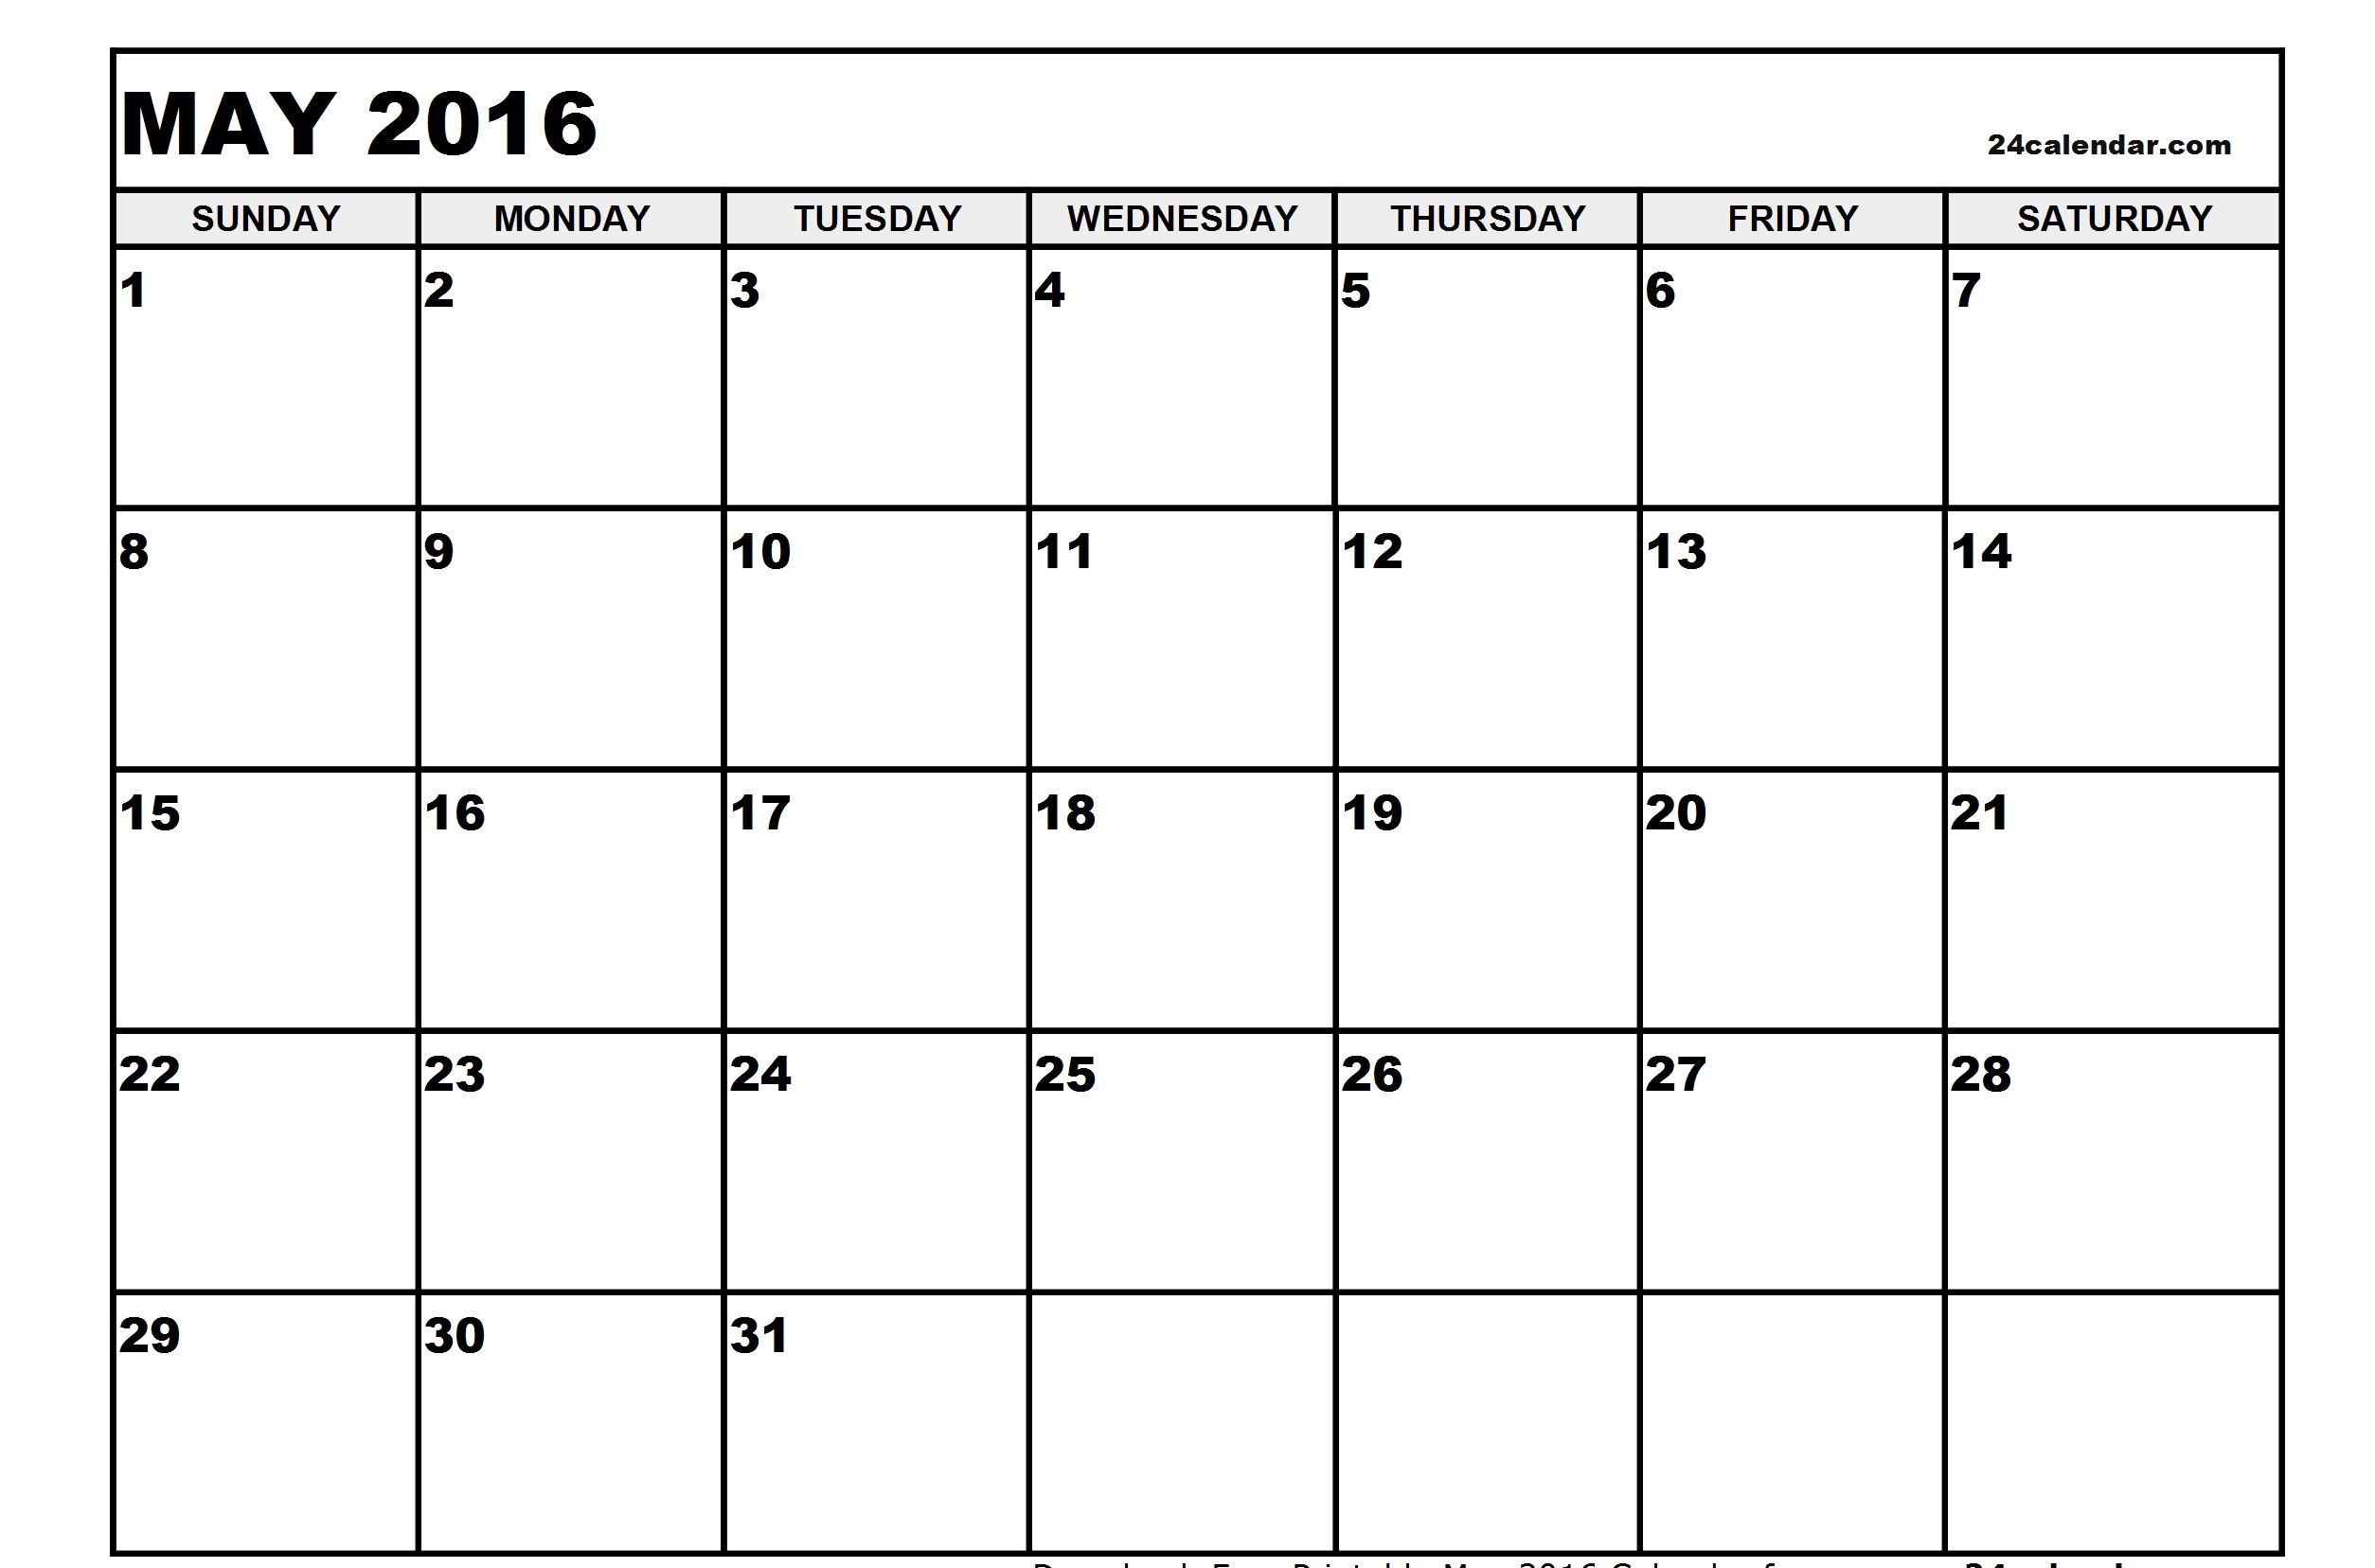 May 2016 Printable calendar | Printable Calendar Templates